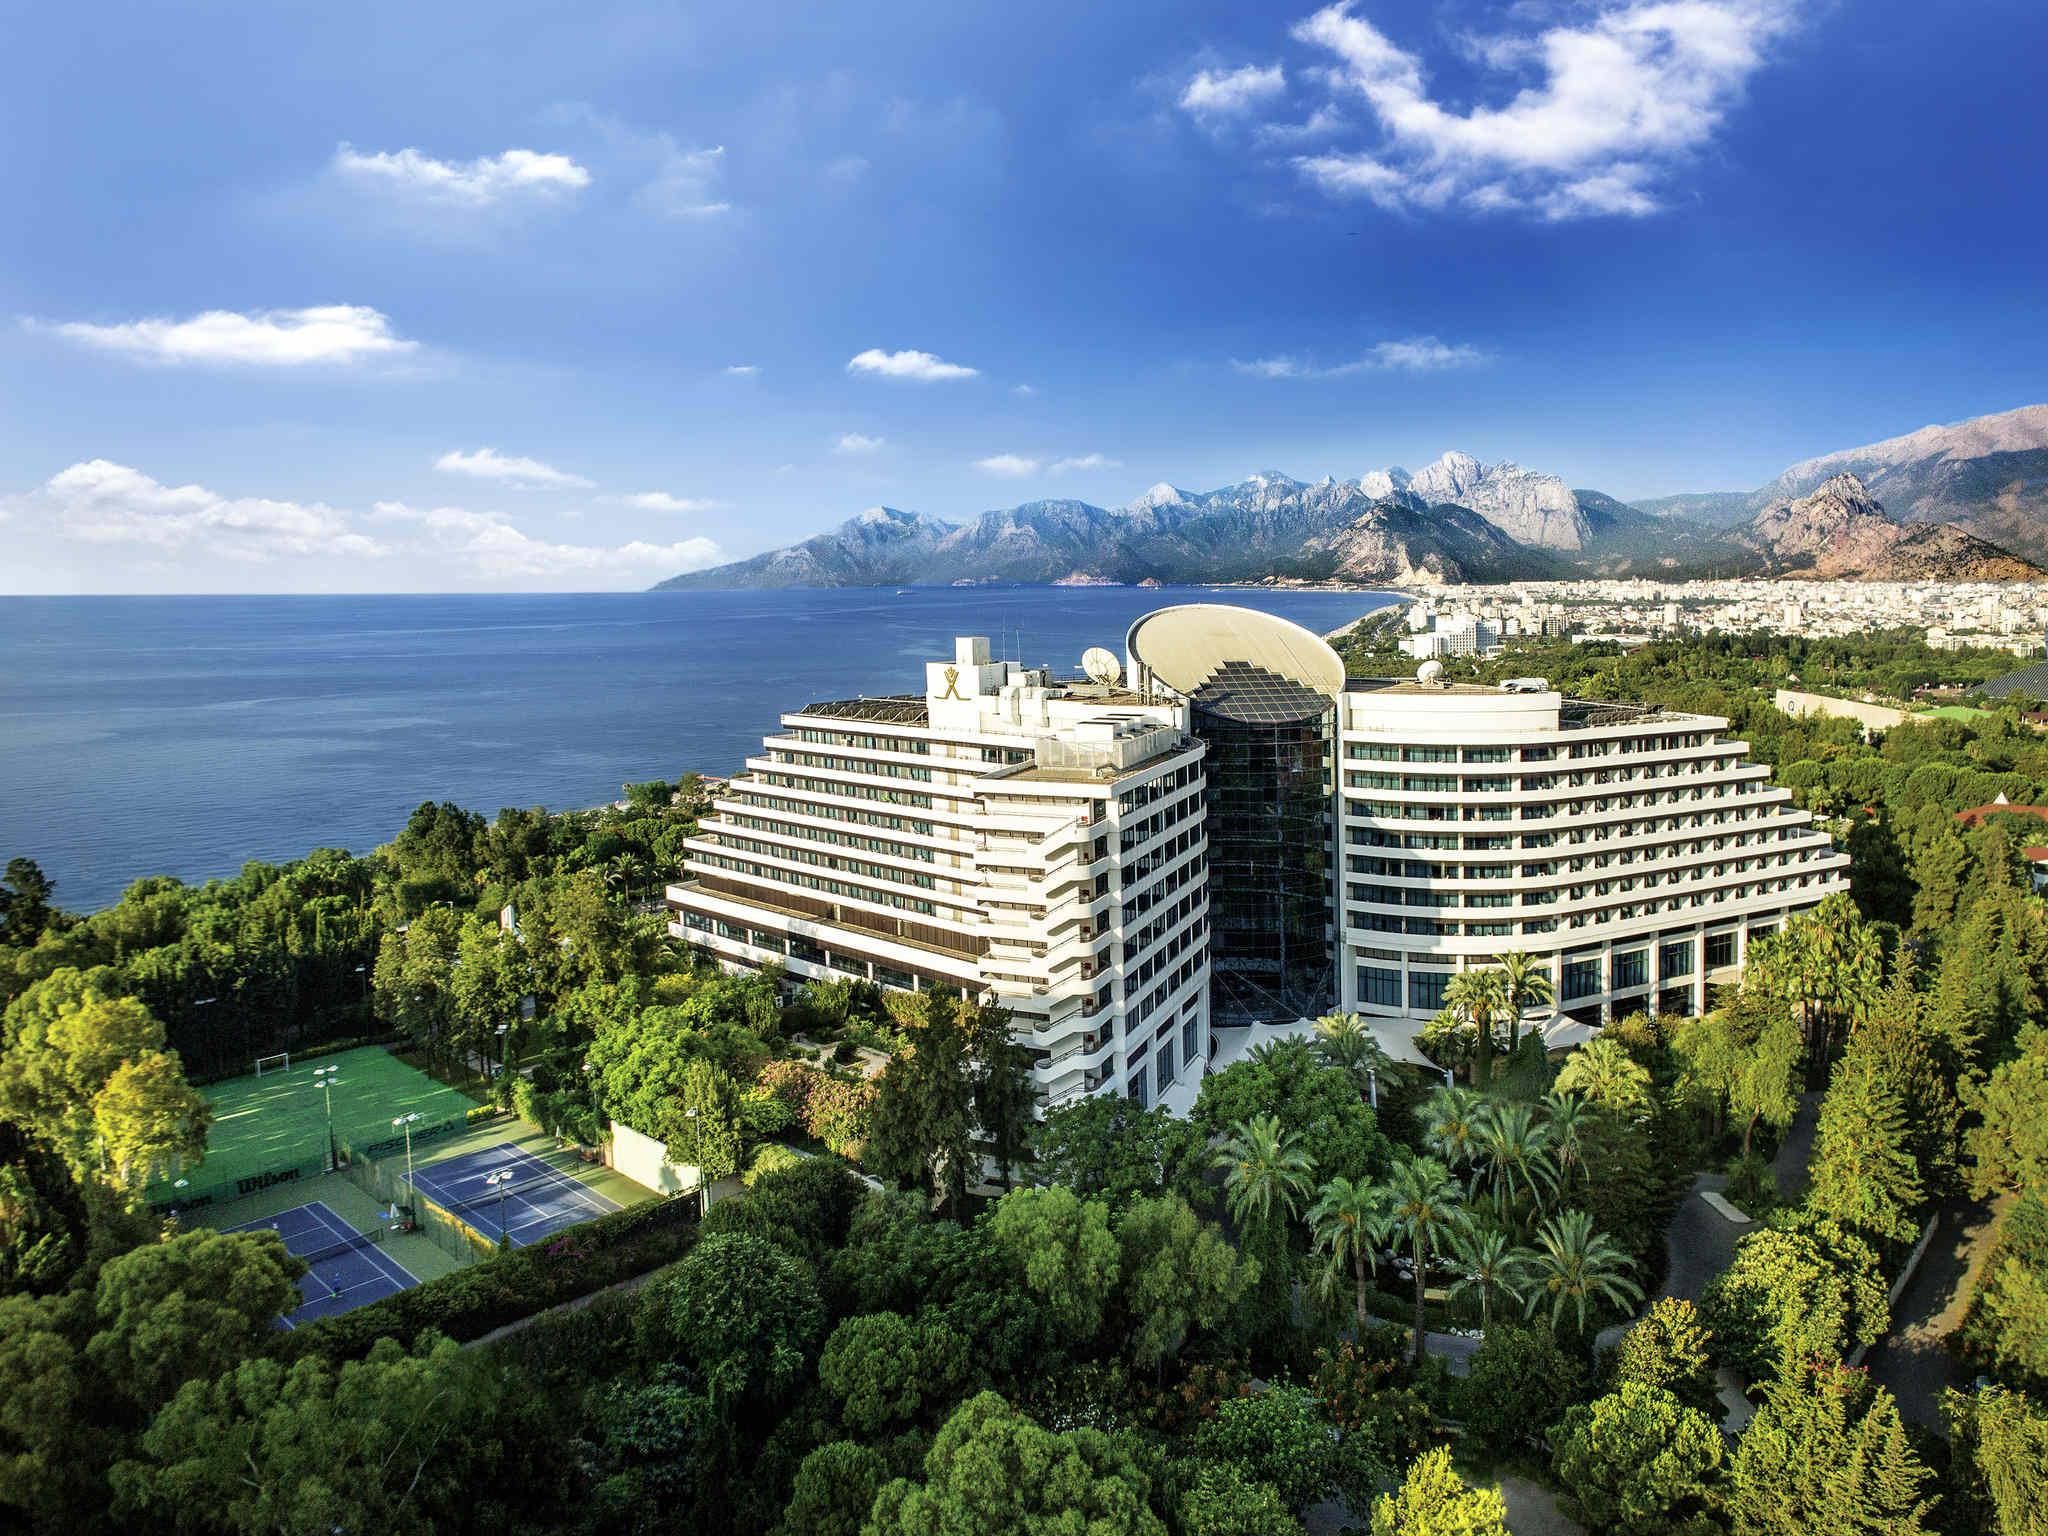 Hotel Rixos Downtown Antalya